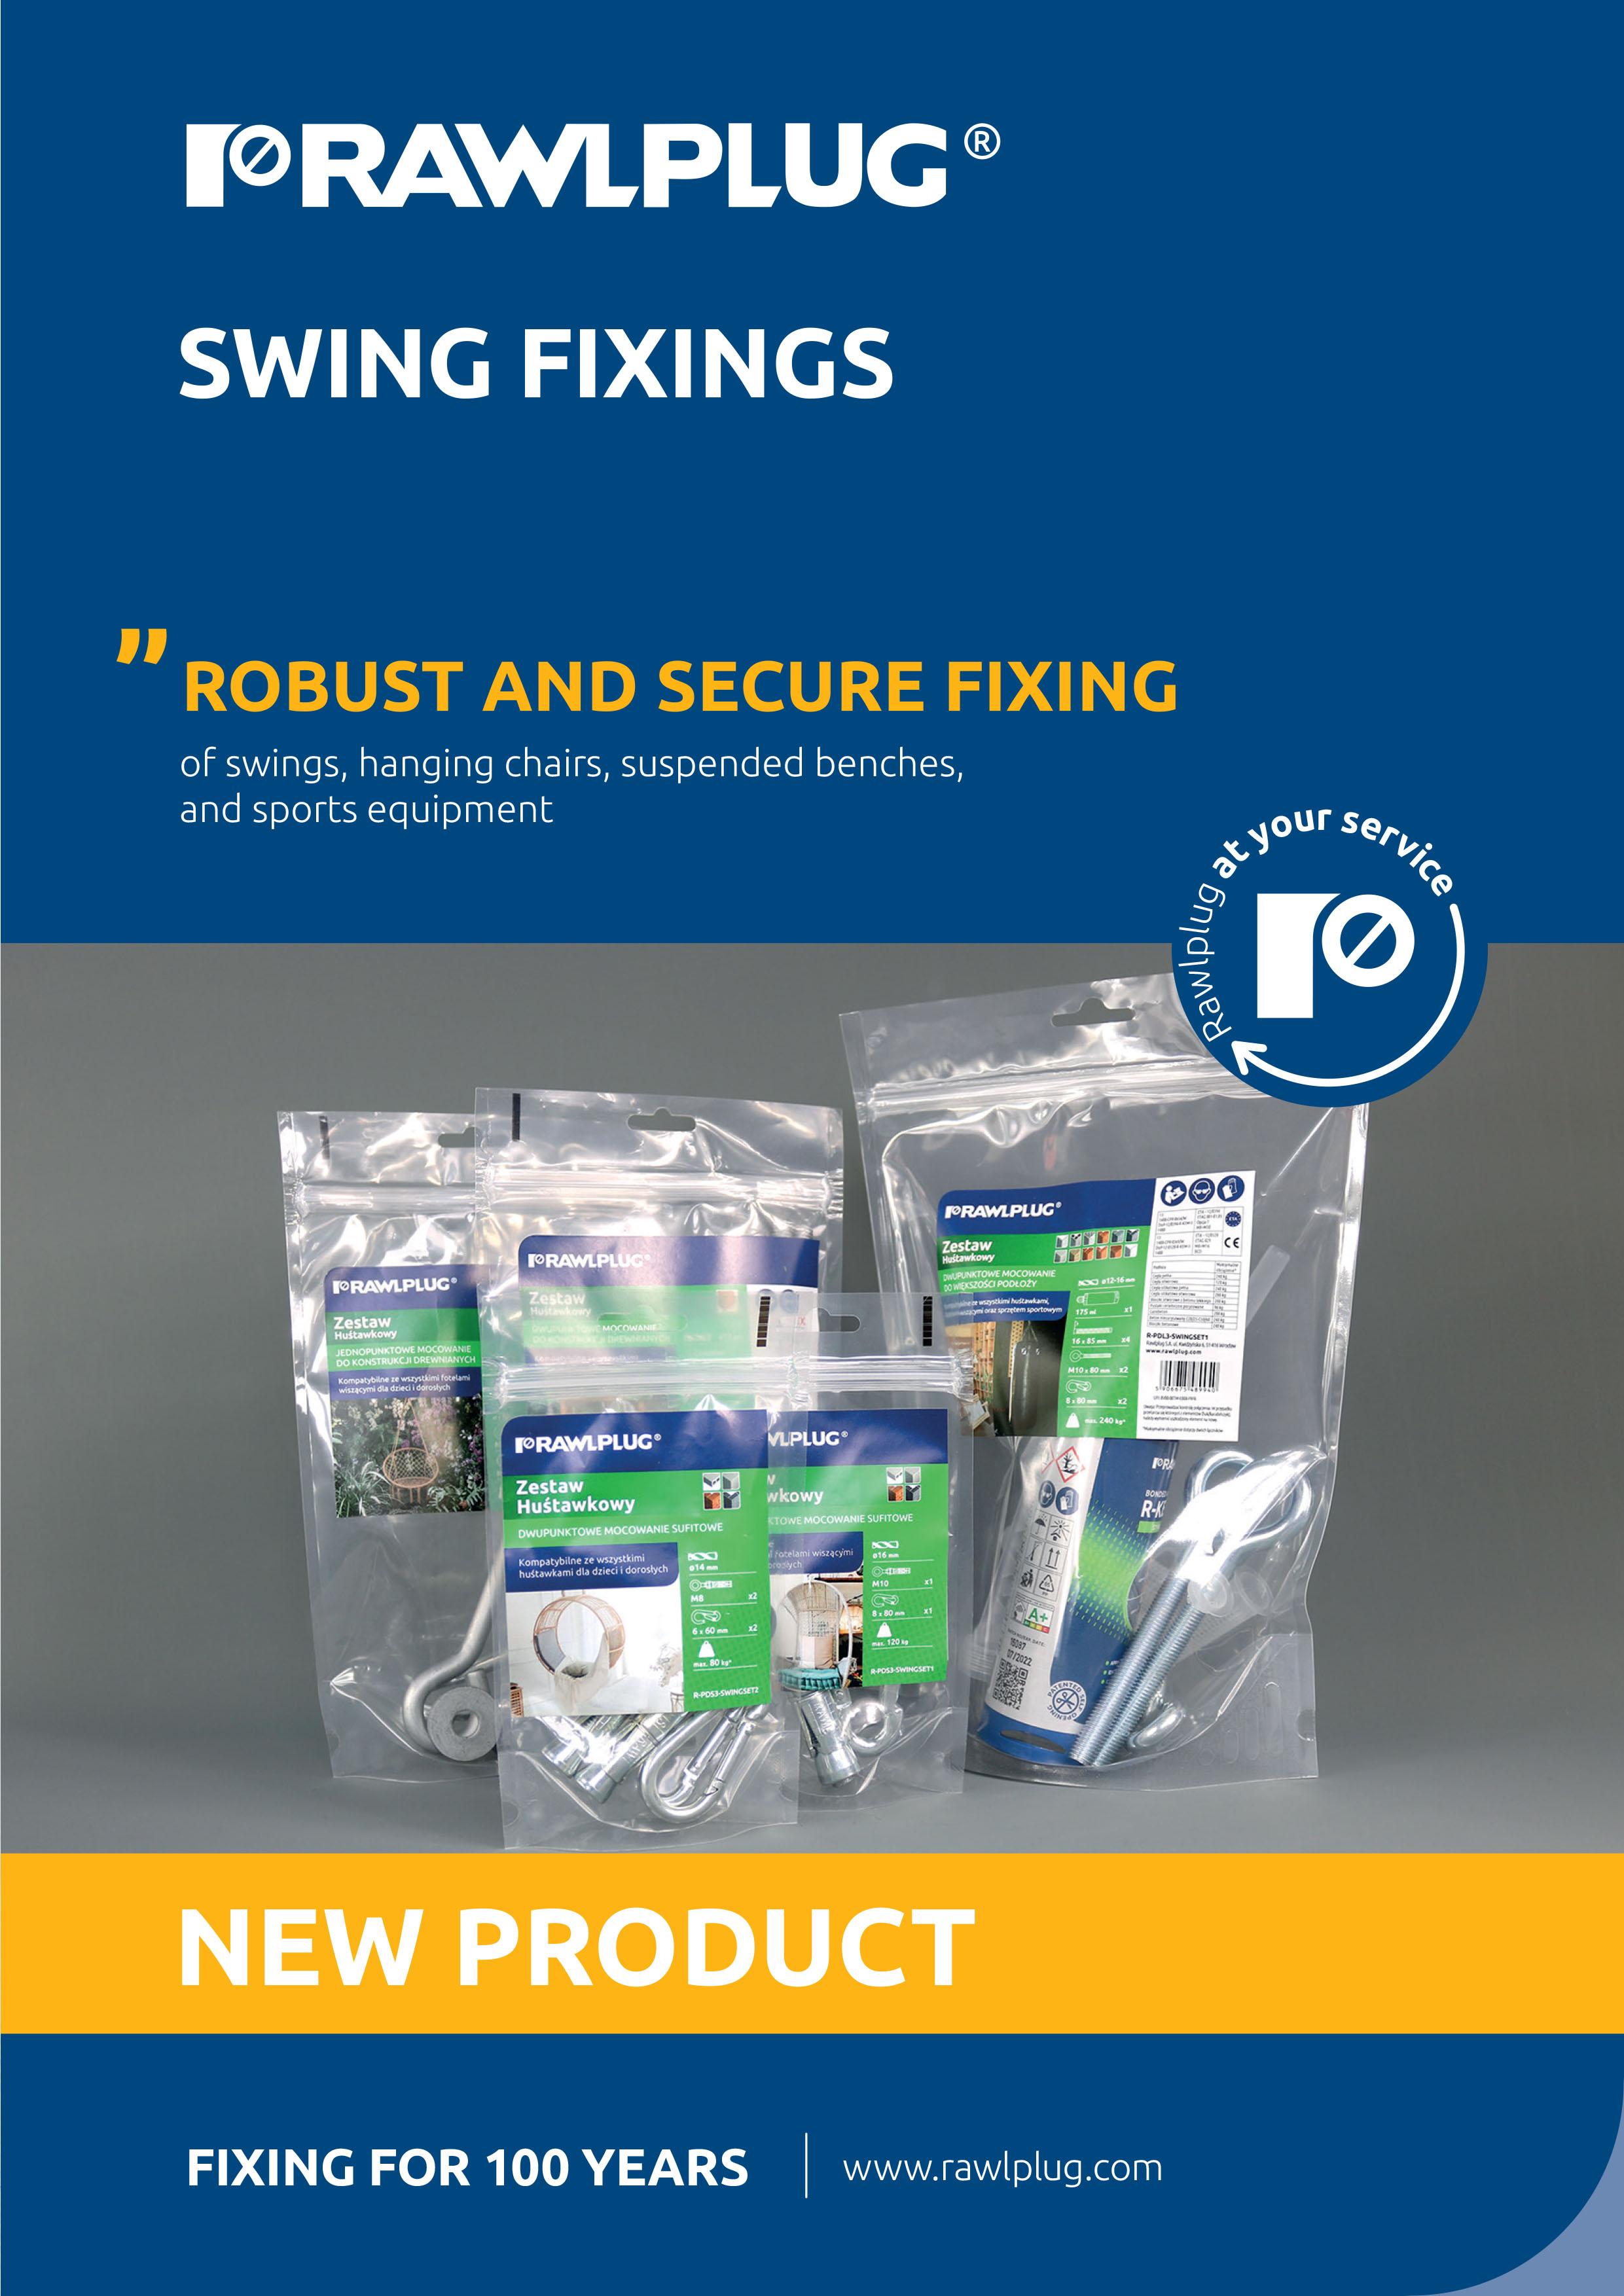 Rawlplug Swing Fixings